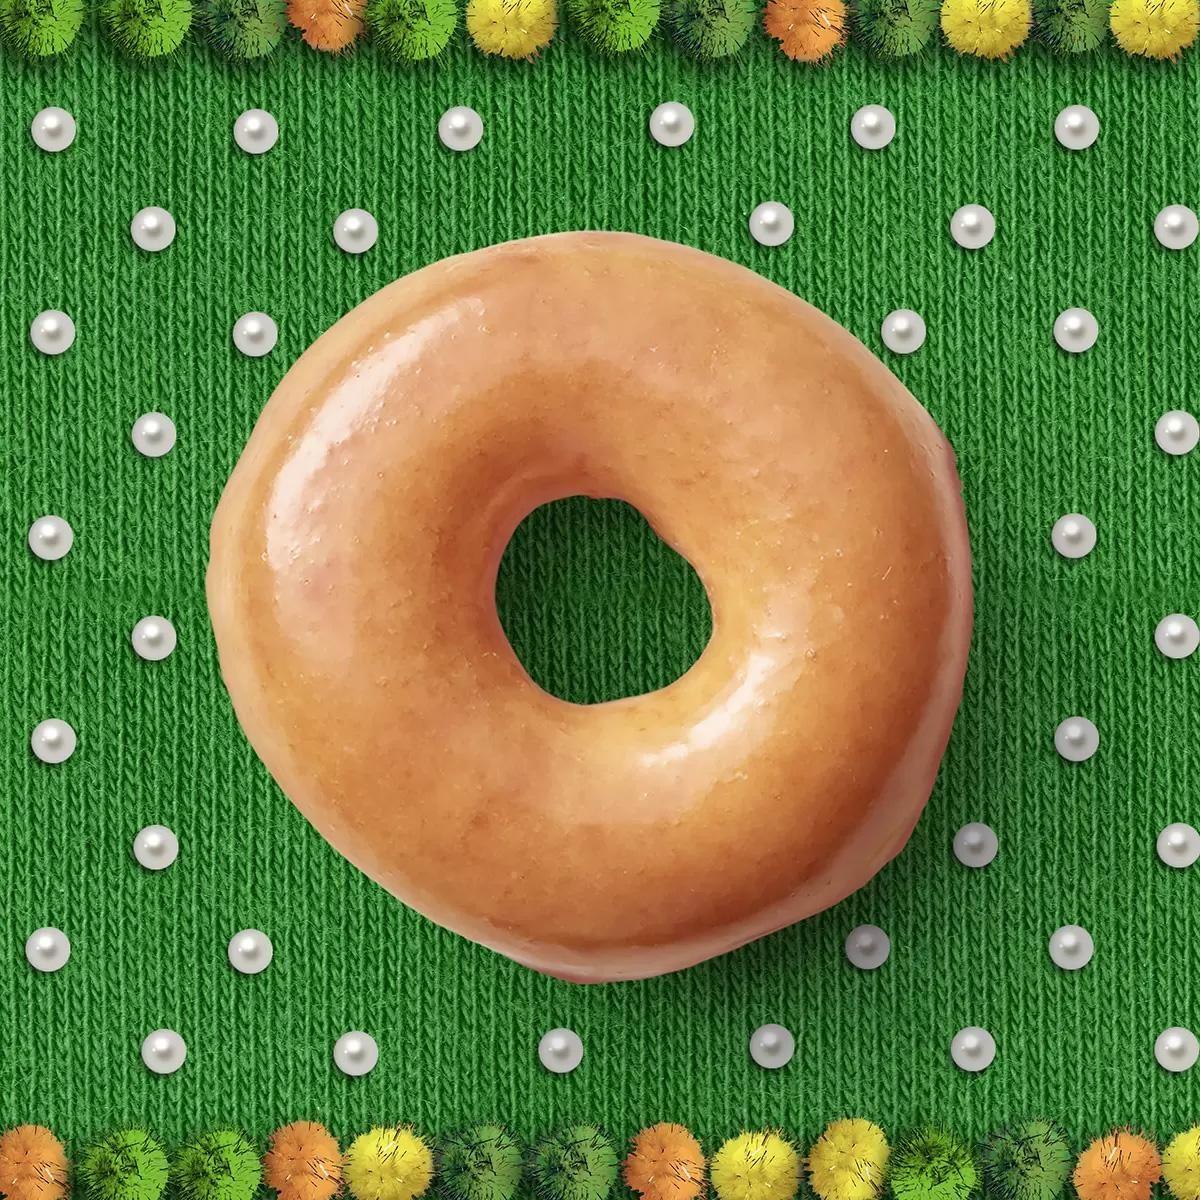 Free krispy kreme doughnut in 2021 krispy kreme doughnut